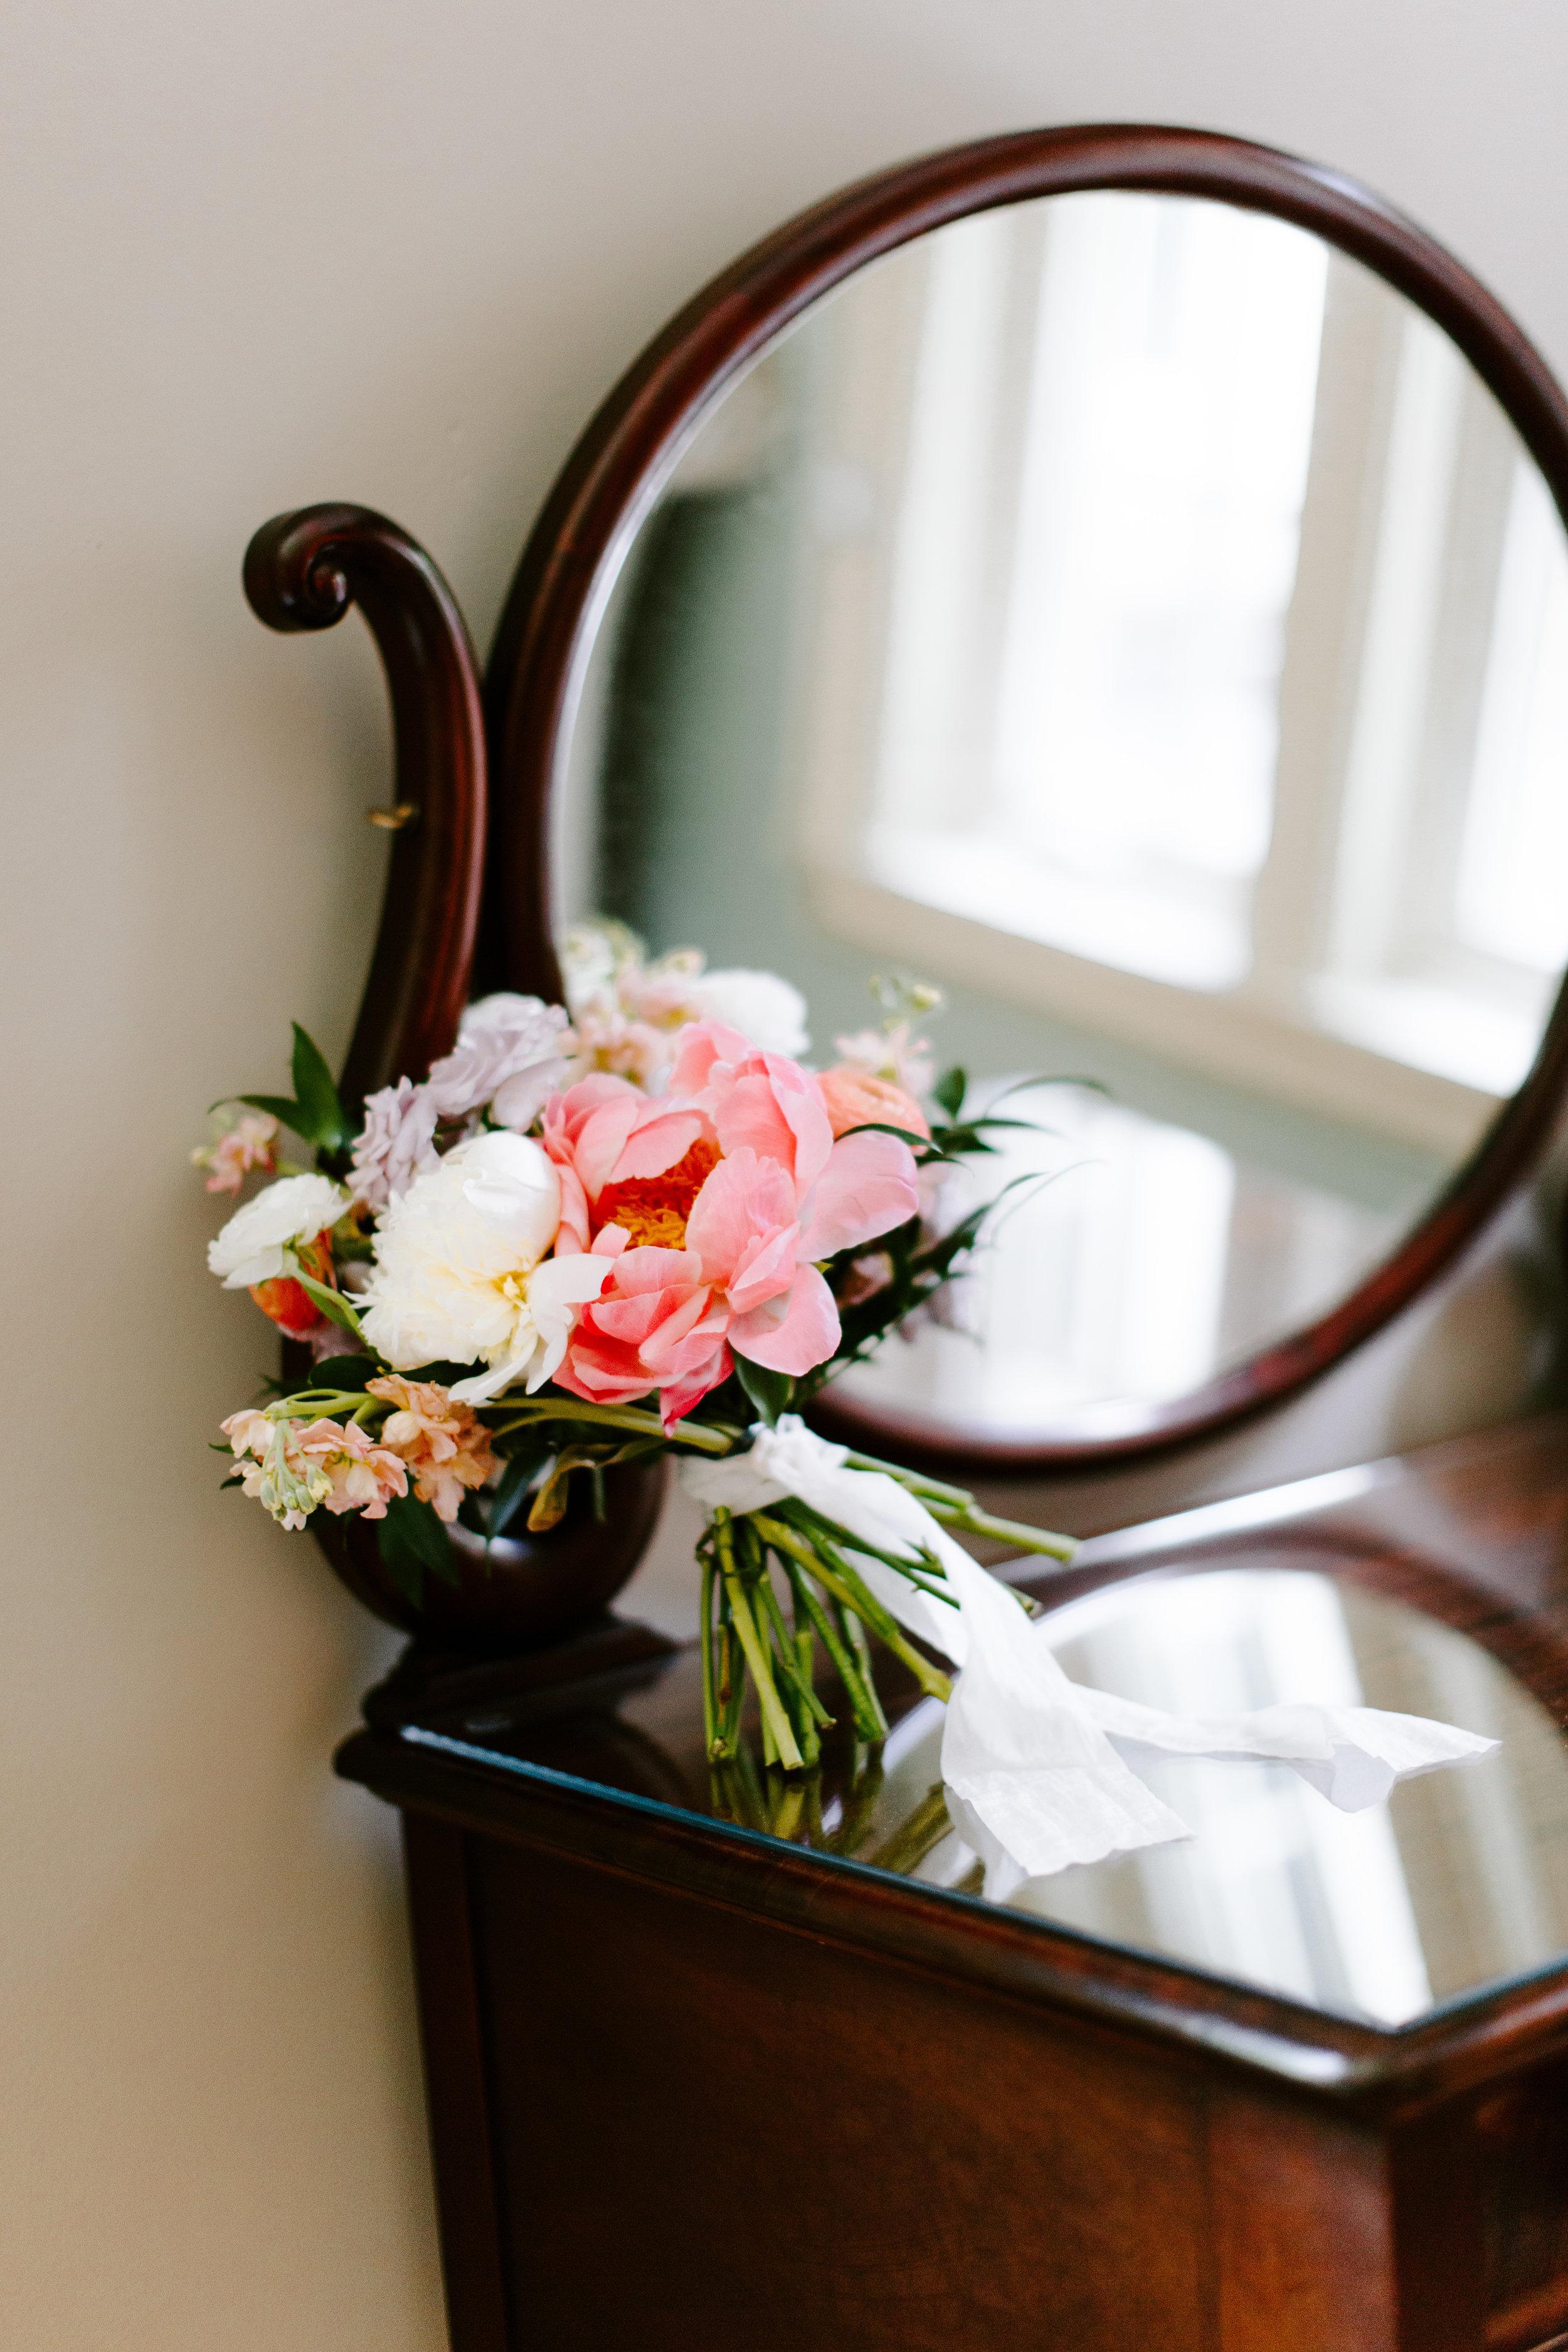 knoxville-wedding-photographer-157.JPG